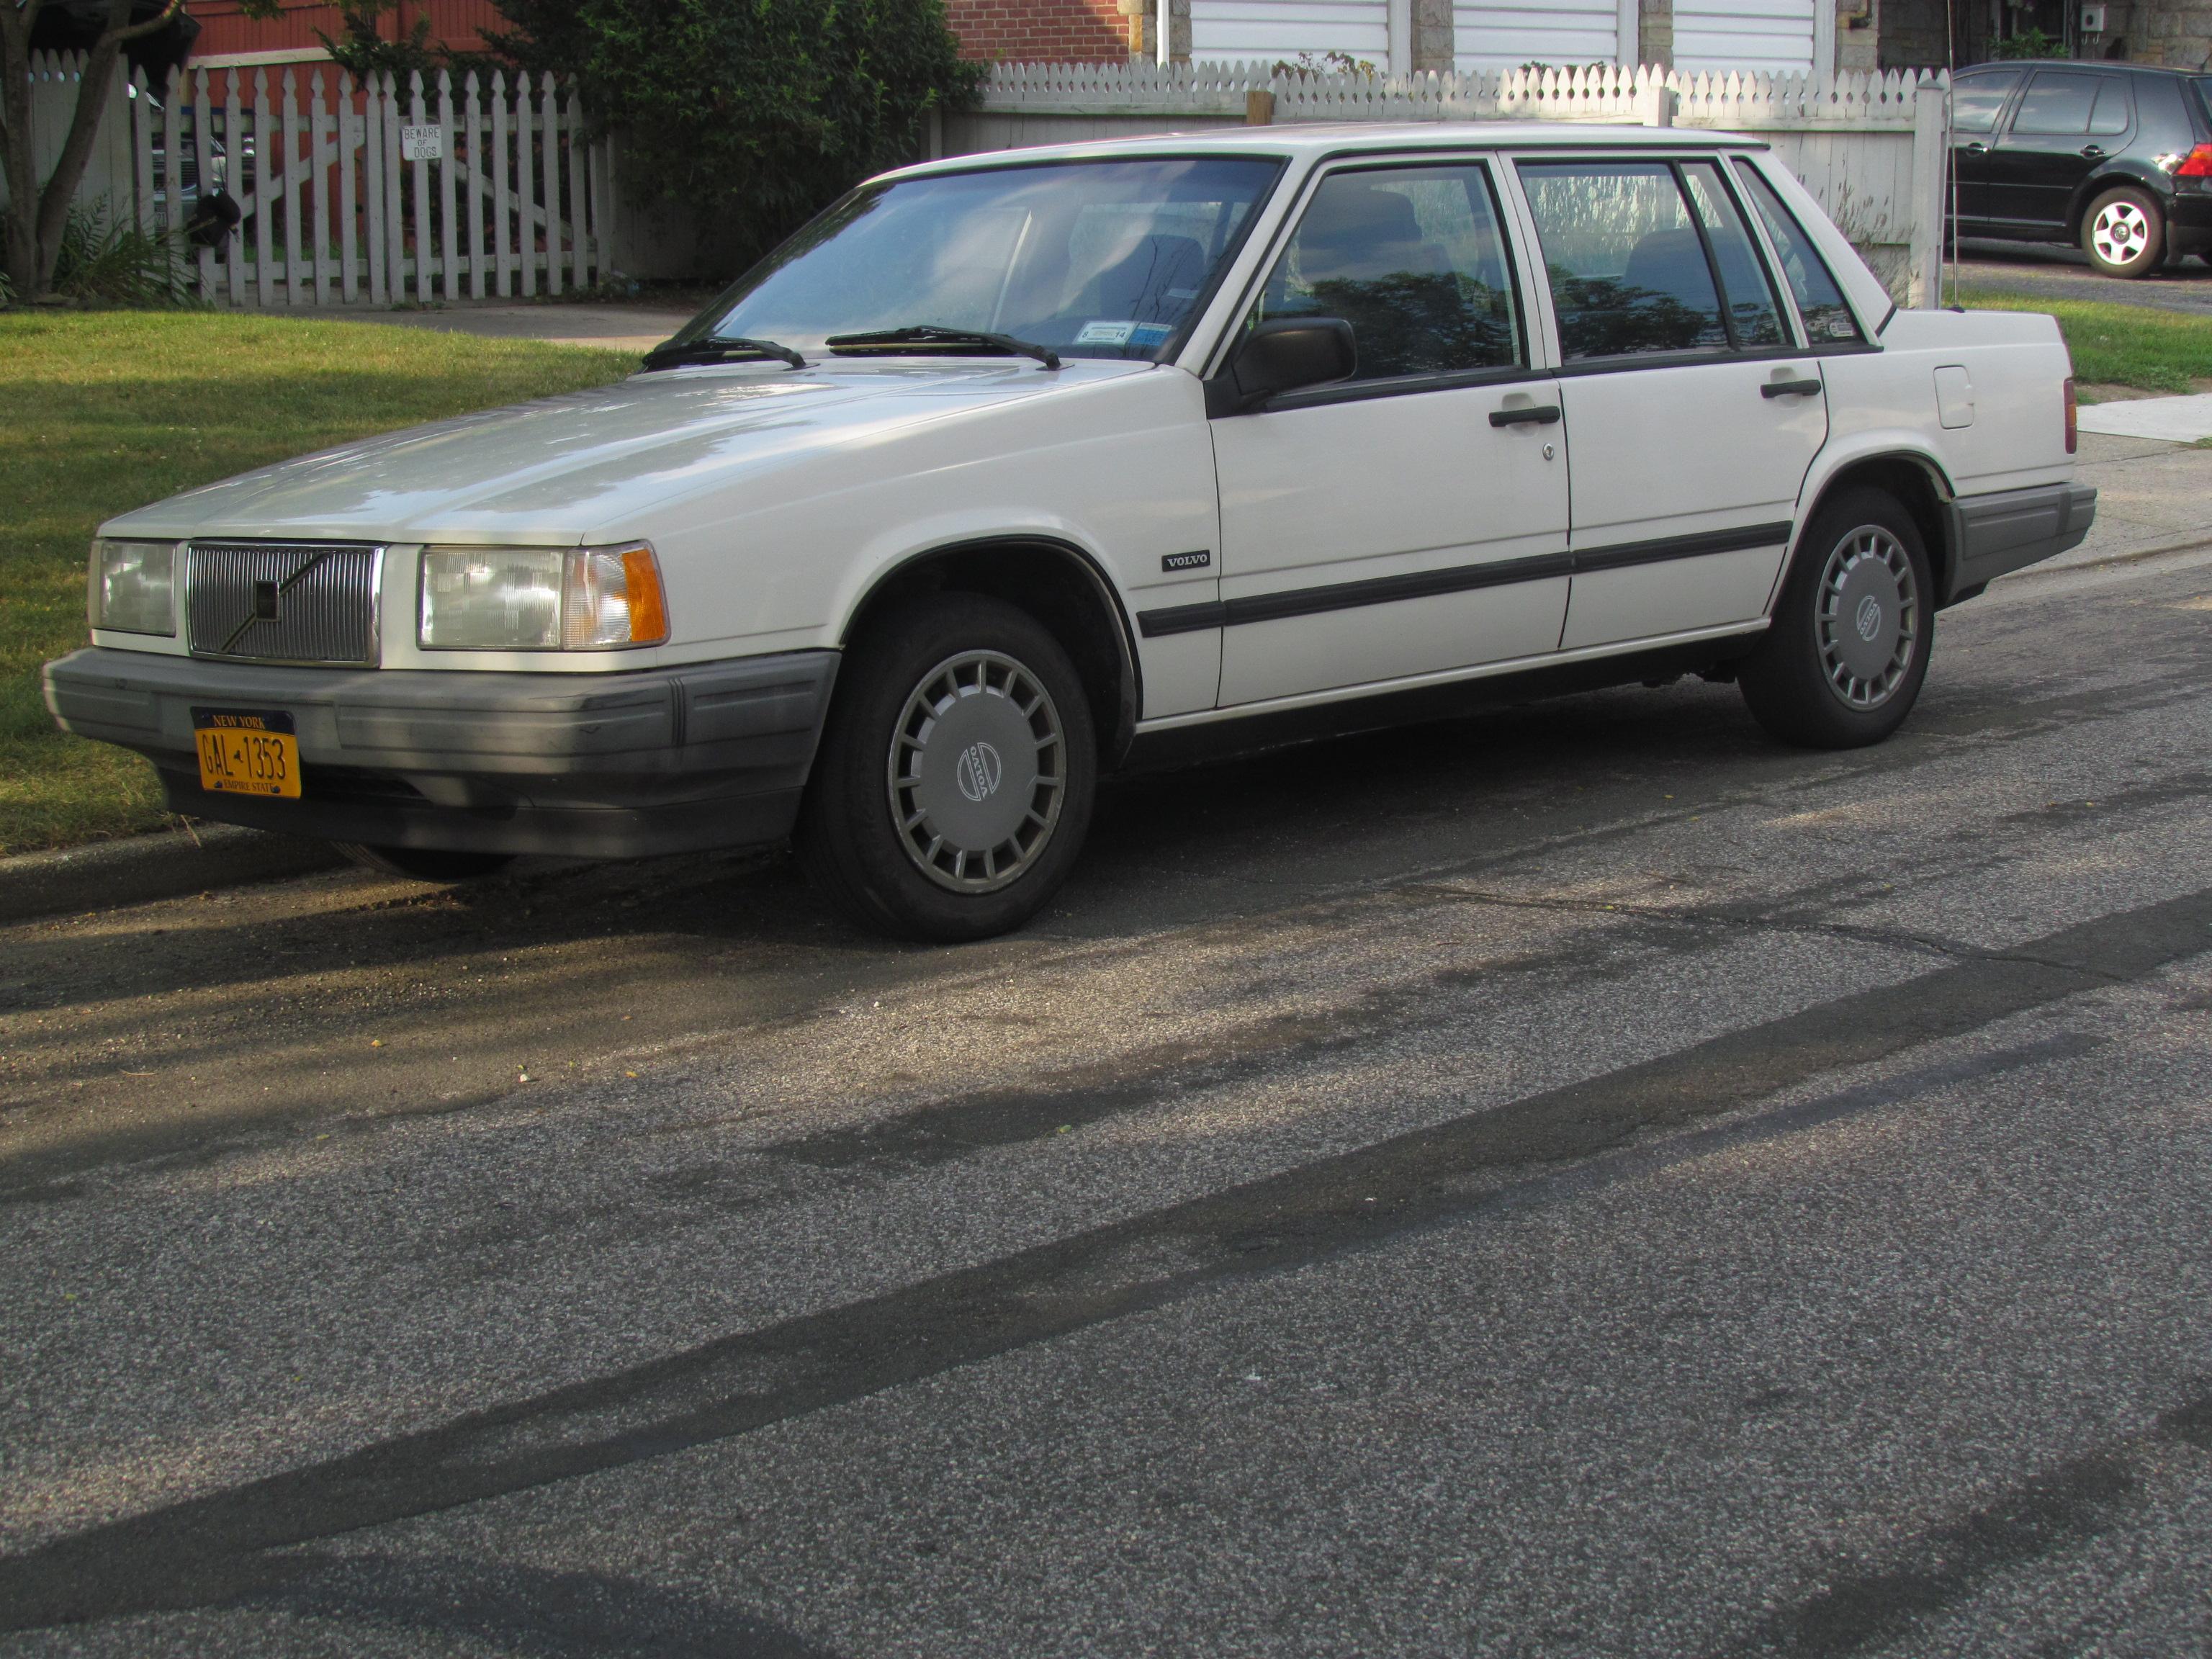 file 1991 volvo 740 sedan jpg wikimedia commons rh commons wikimedia org 1991 Volvo 940 1990 740 Volvo Tail Lights